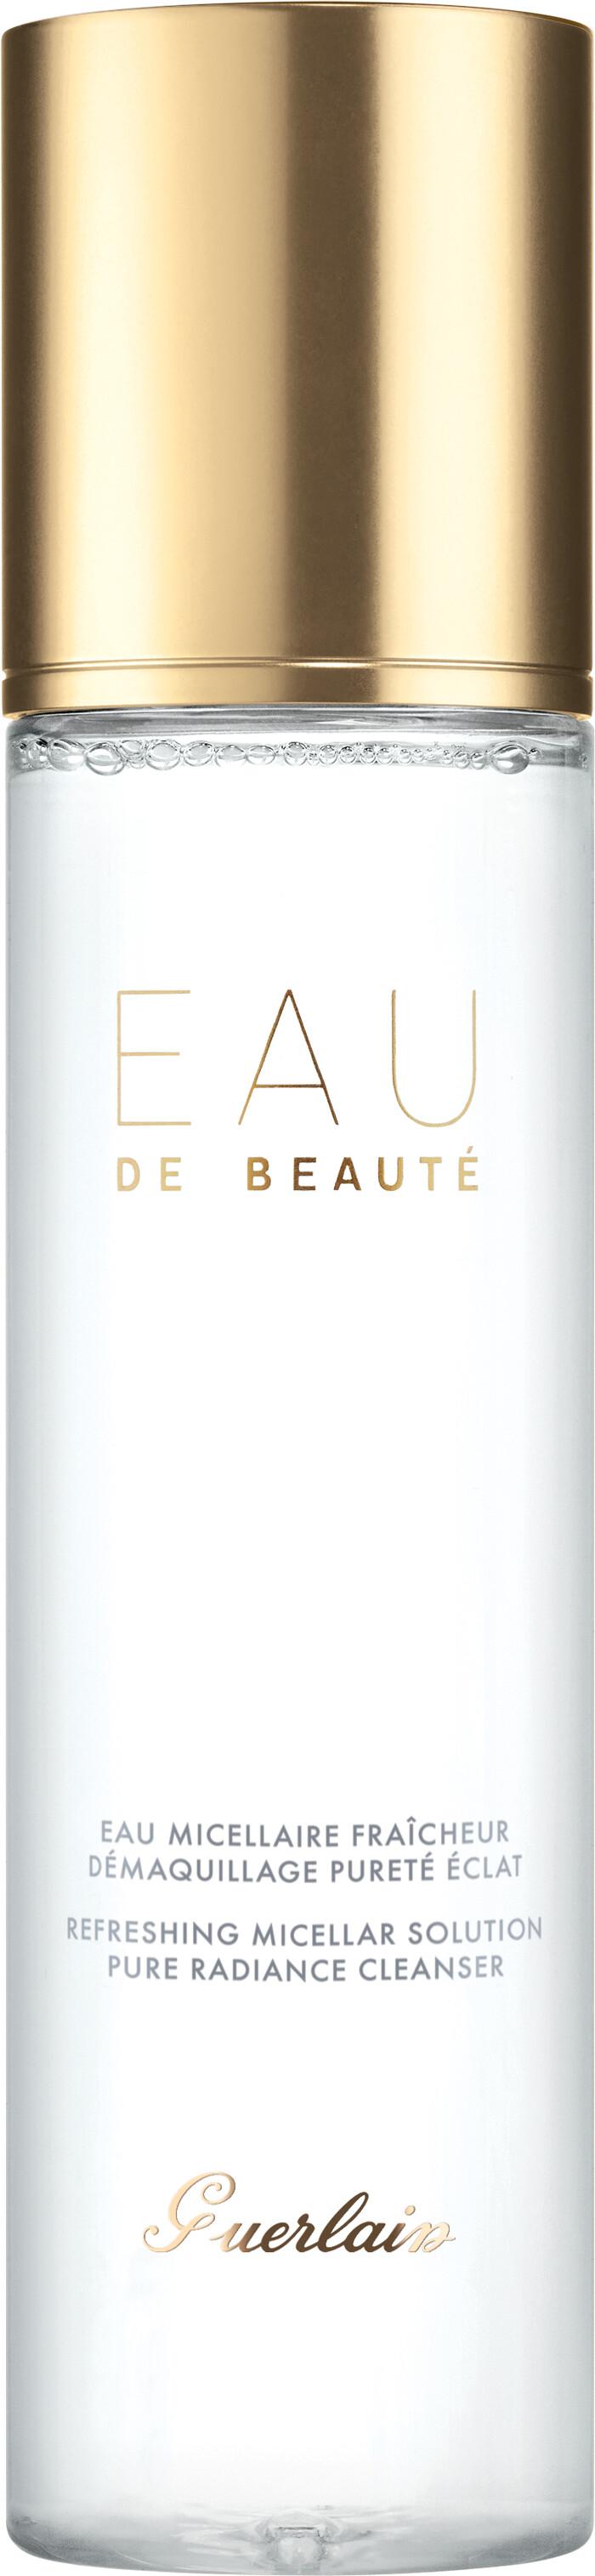 GUERLAIN Eau de Beaute Micellar Solution  Pure Radiance Cleanser 200ml